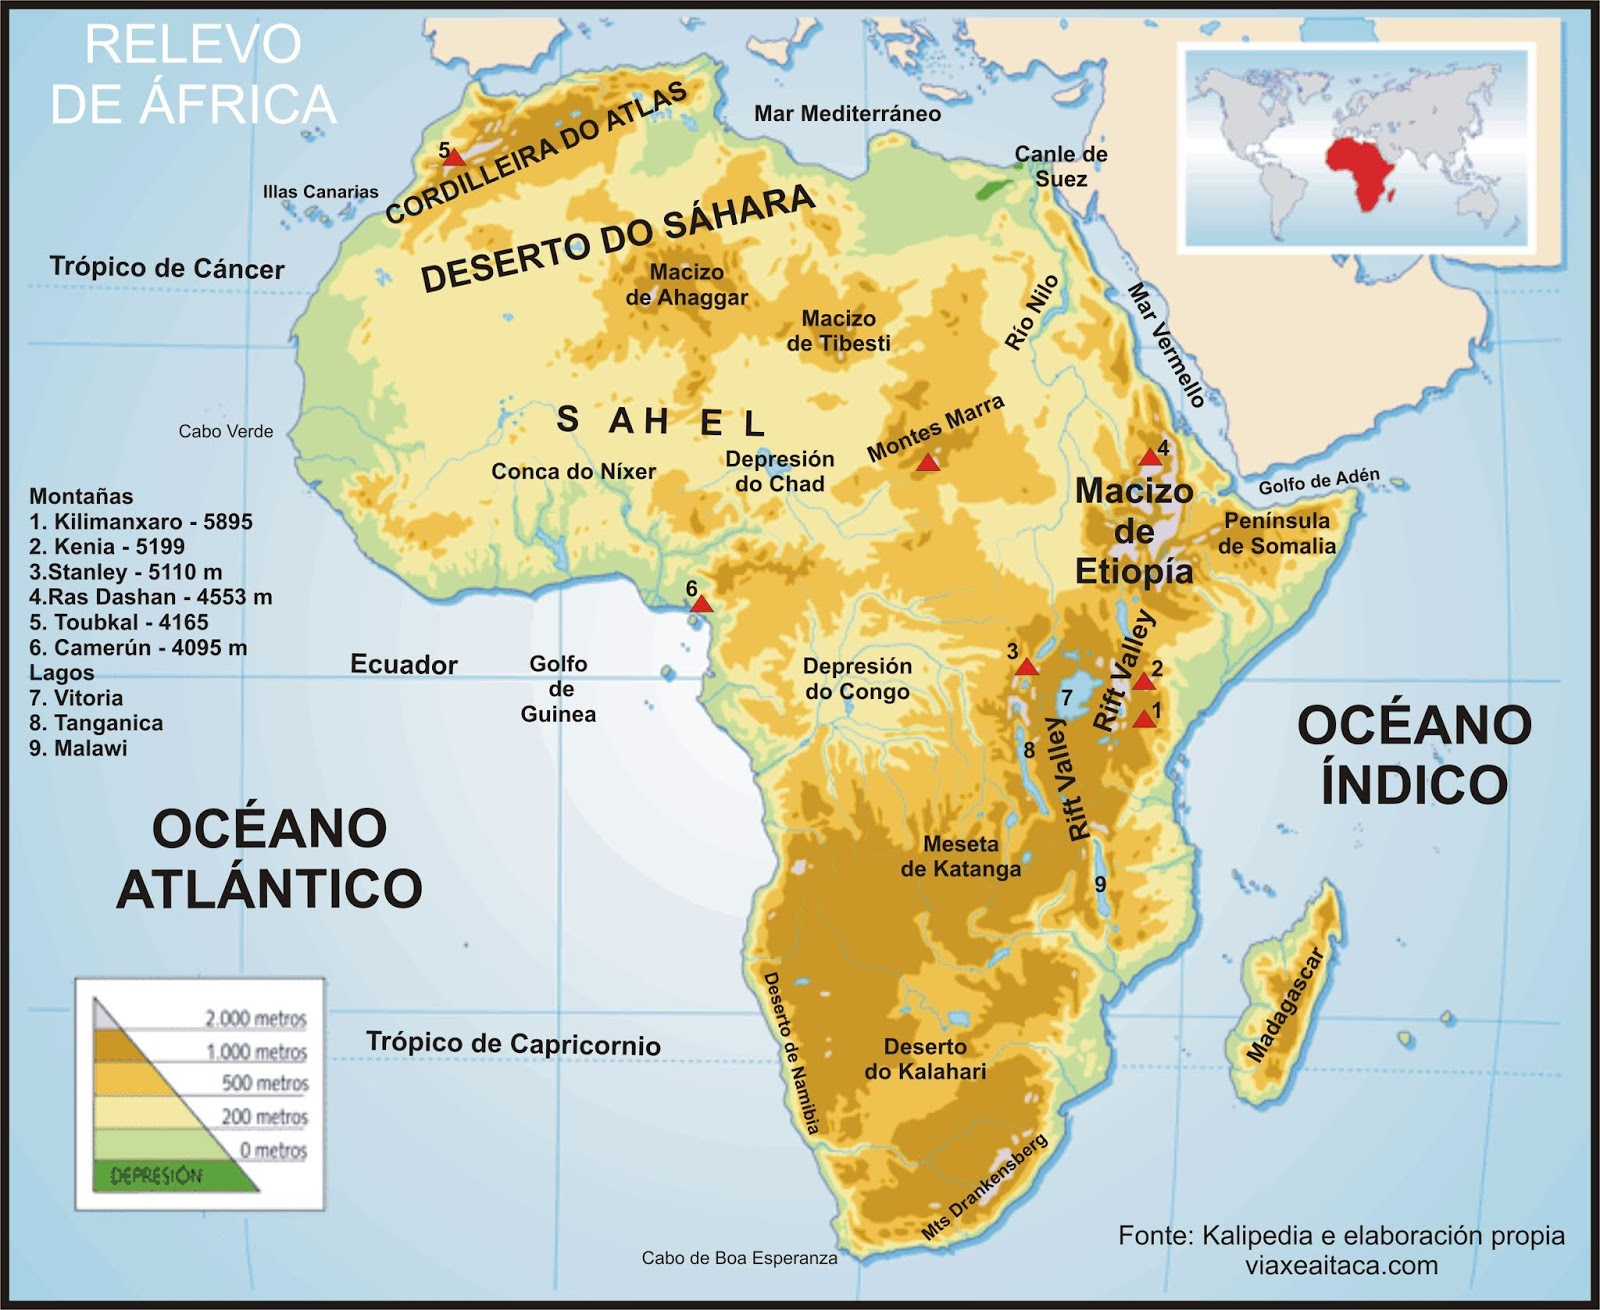 Geografia física da África